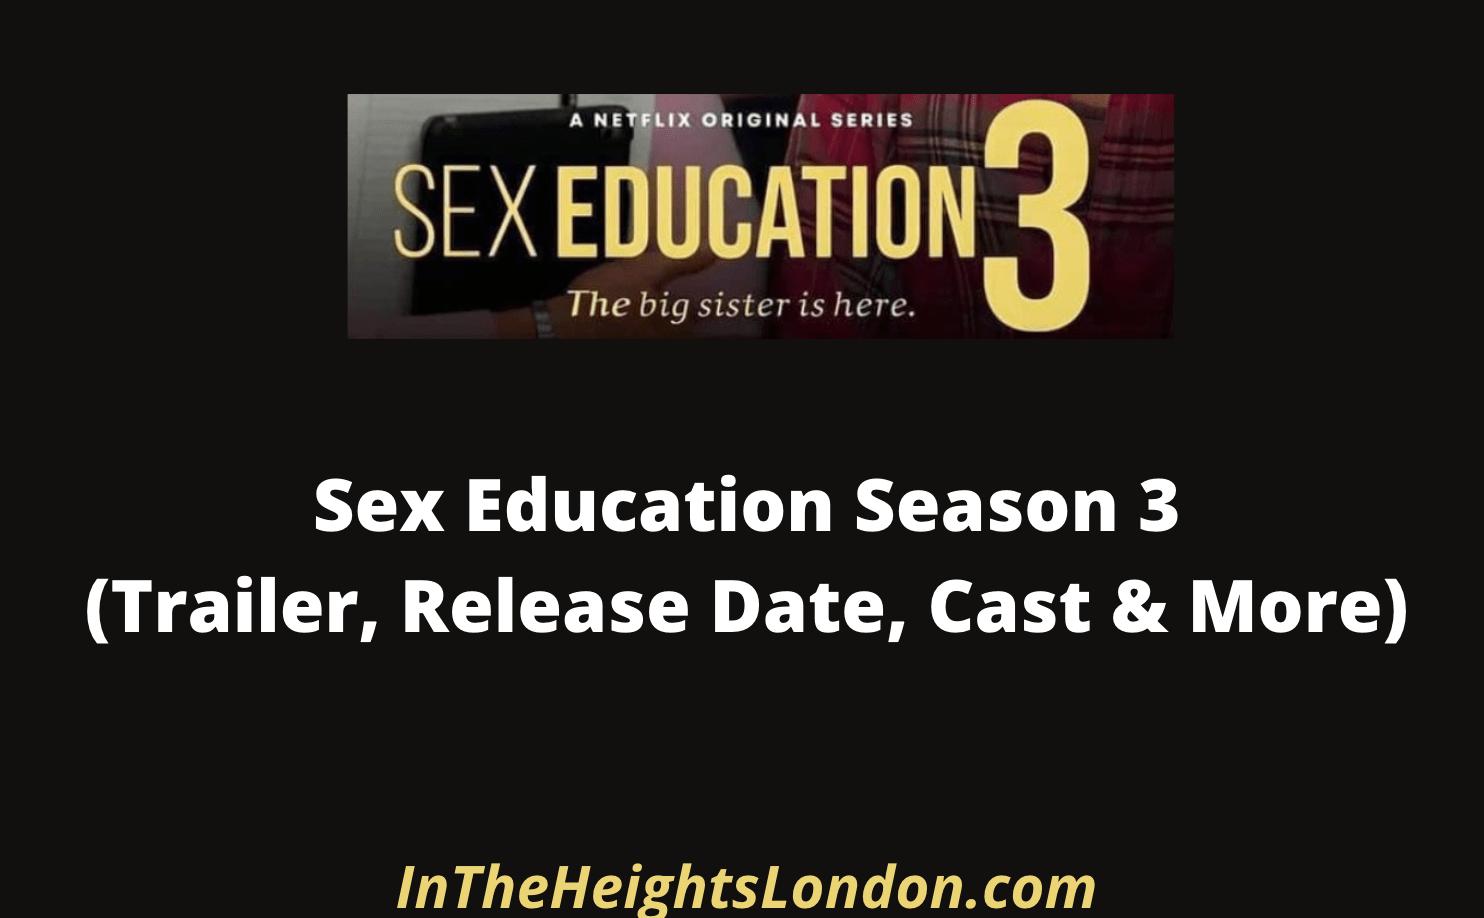 Sex Education 3